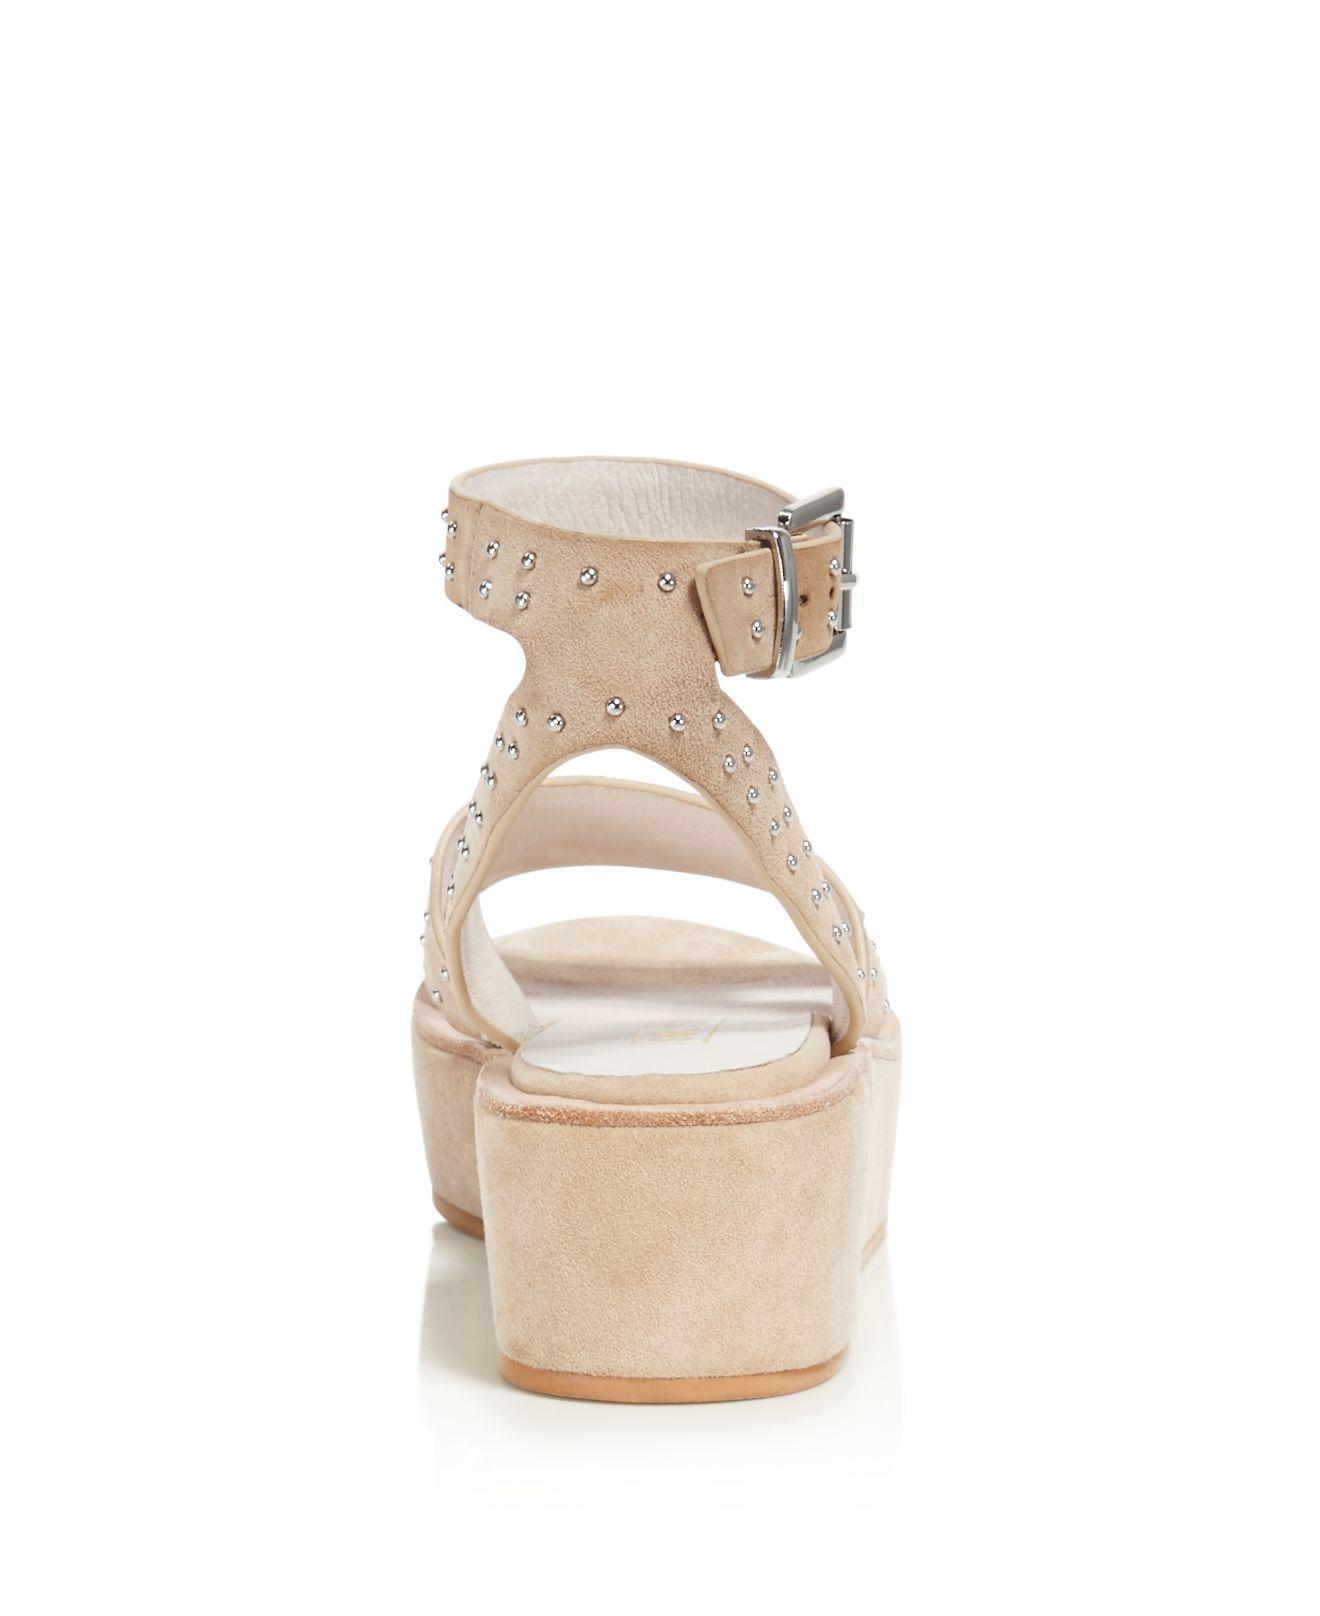 Sol Sana Women's Penelope Studded Suede Platform Ankle Strap Sandals BFZPUch